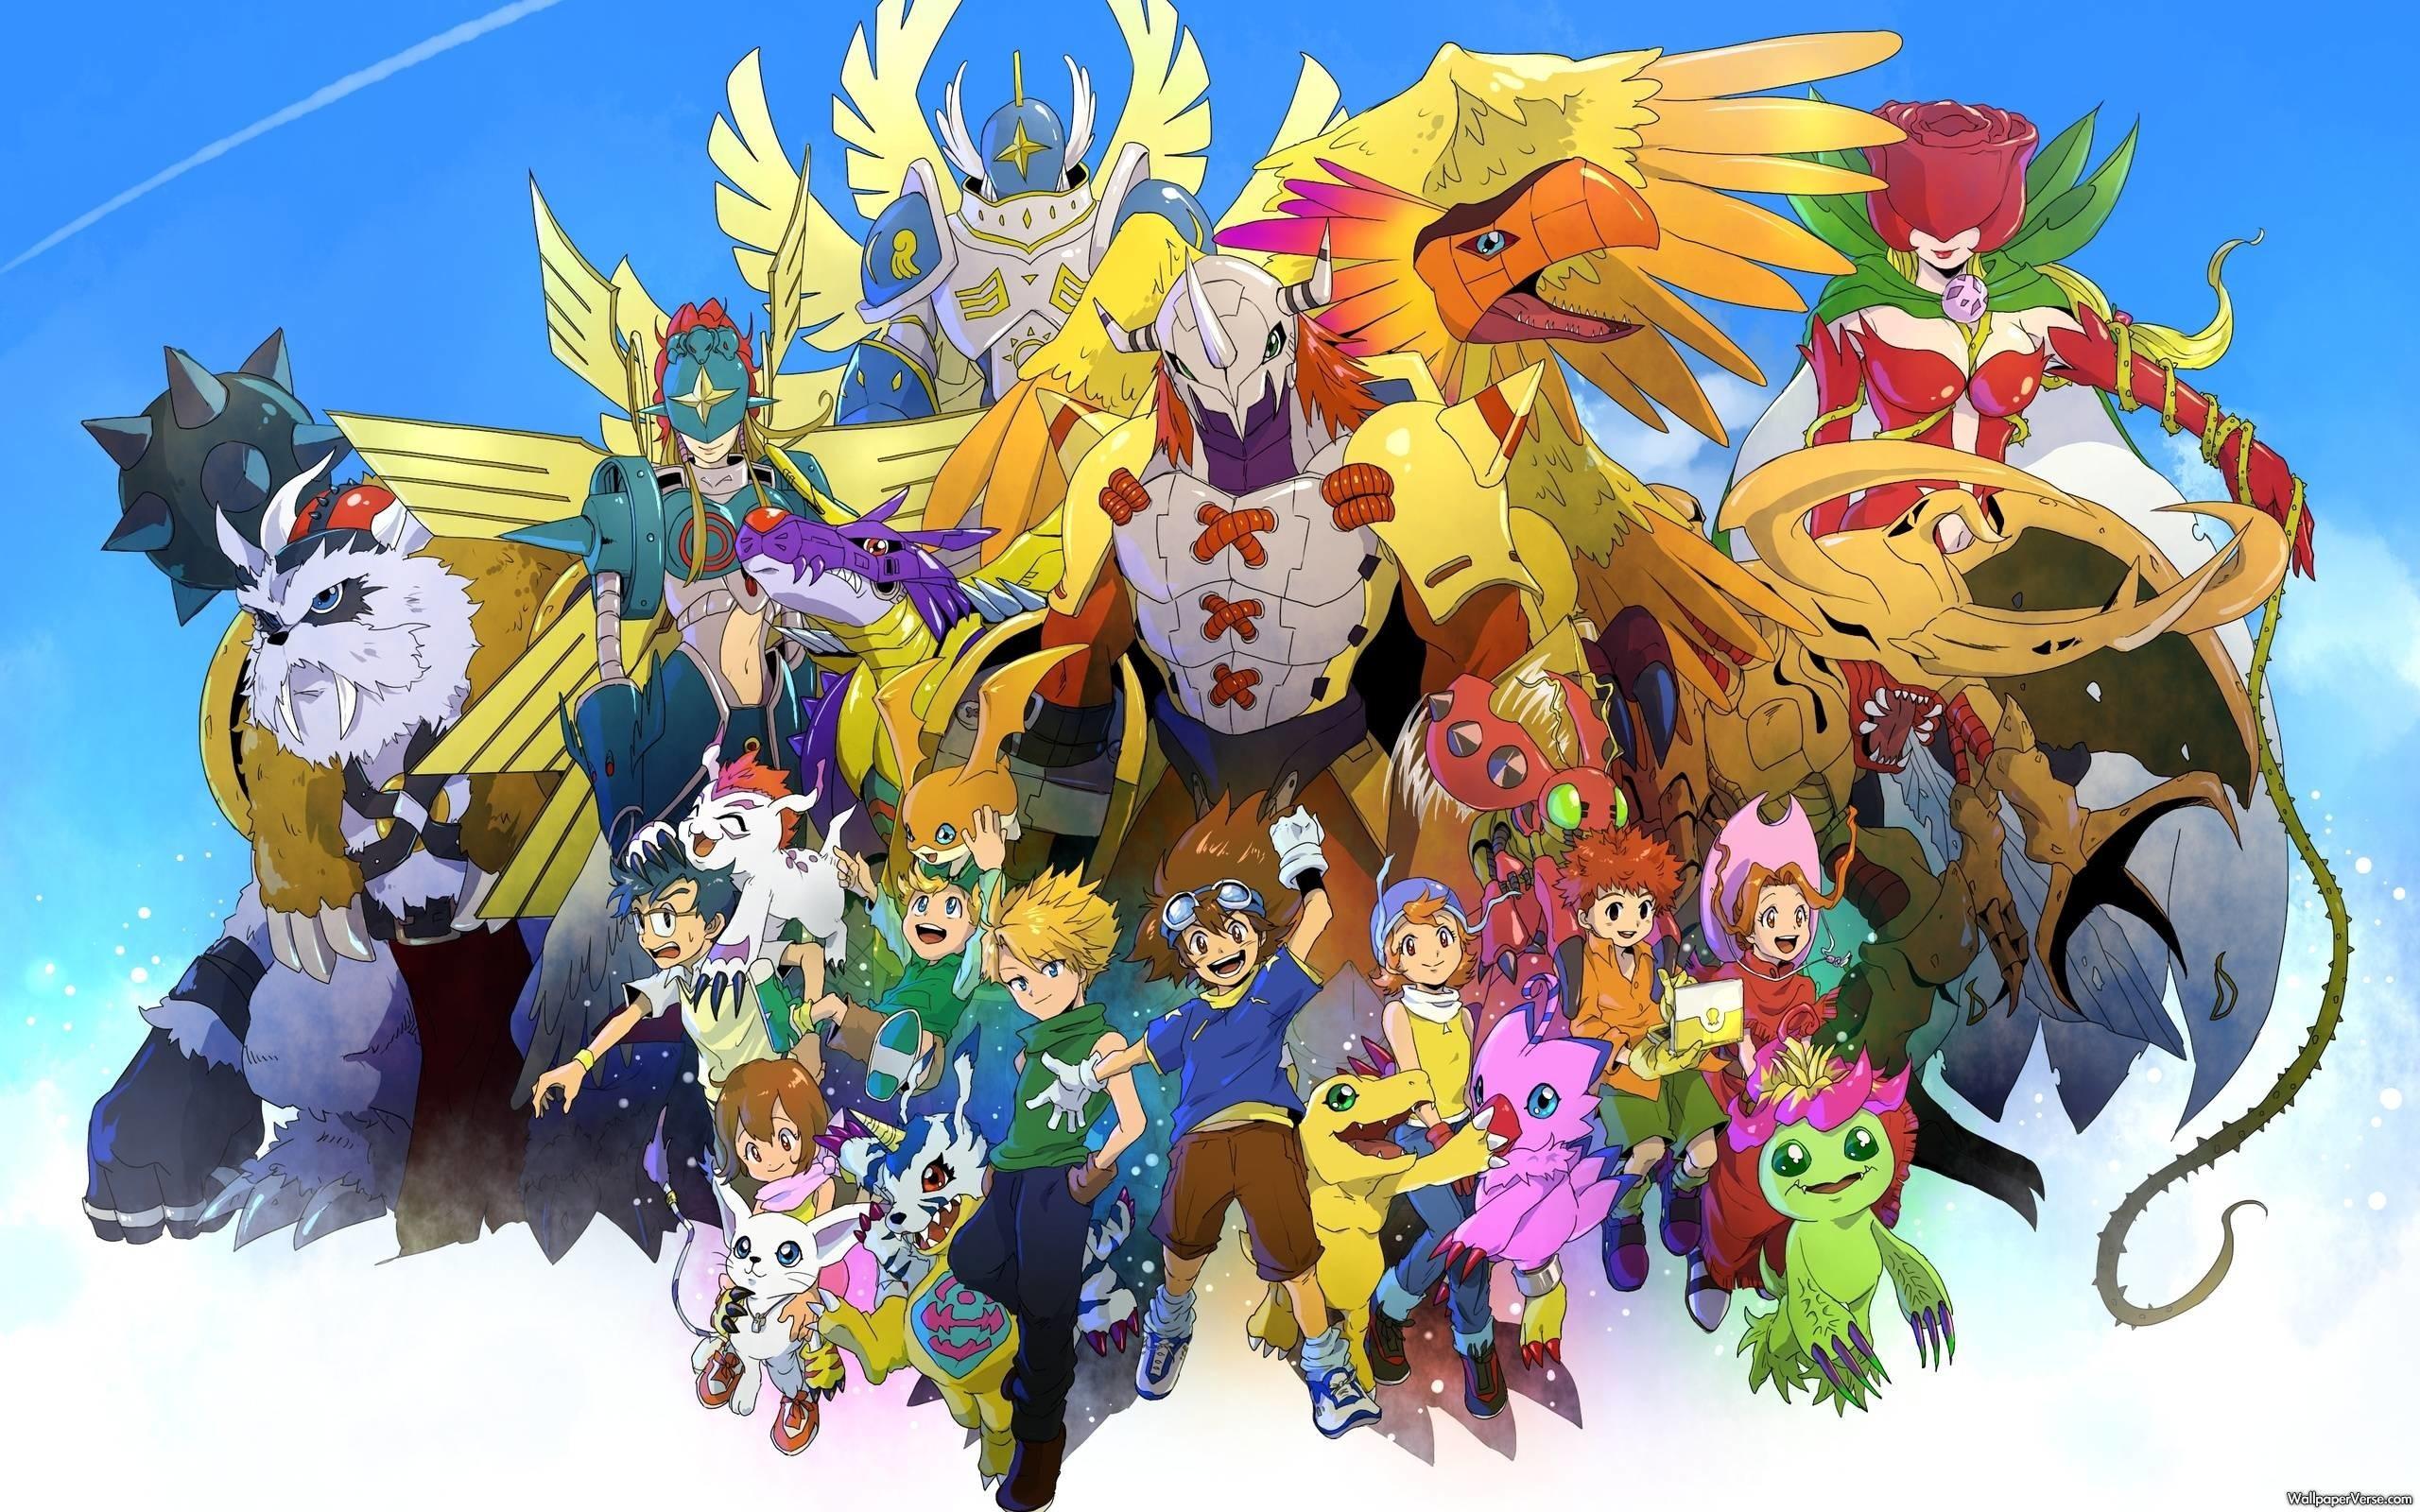 Res: 2560x1600, Digimon Wallpaper